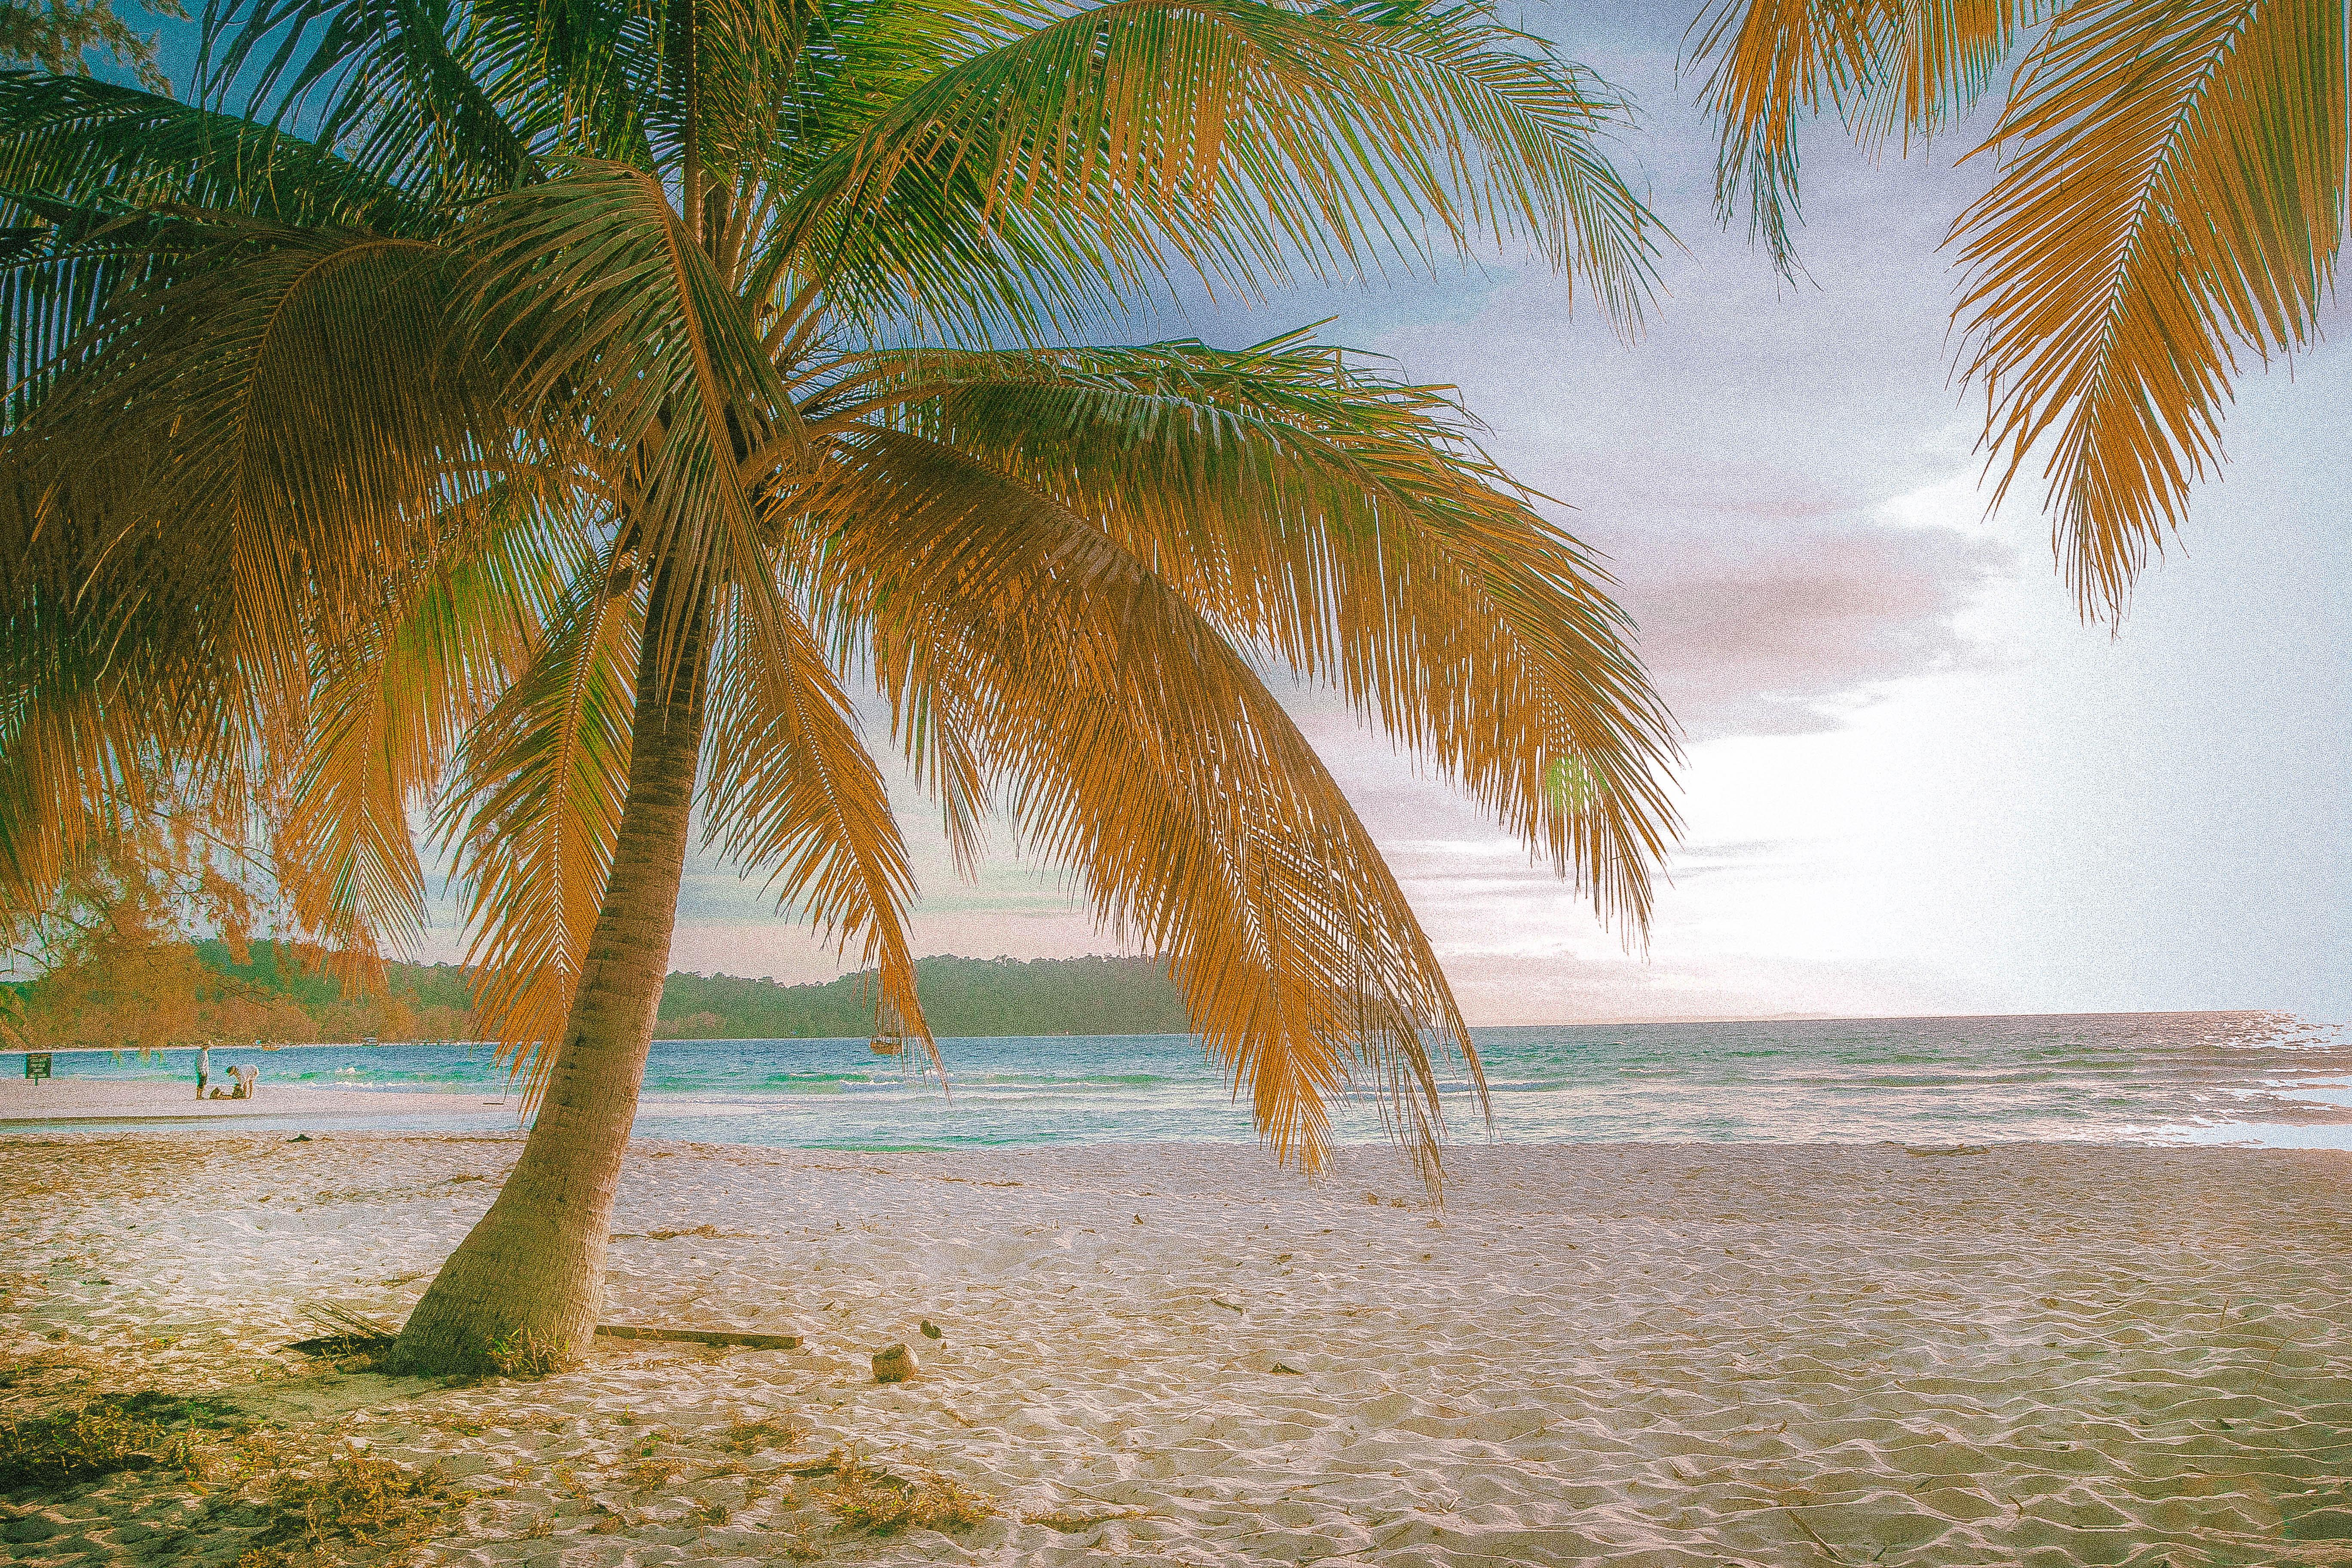 cambodia koh rong island palm sunshine sand beach relaxing day sunrise